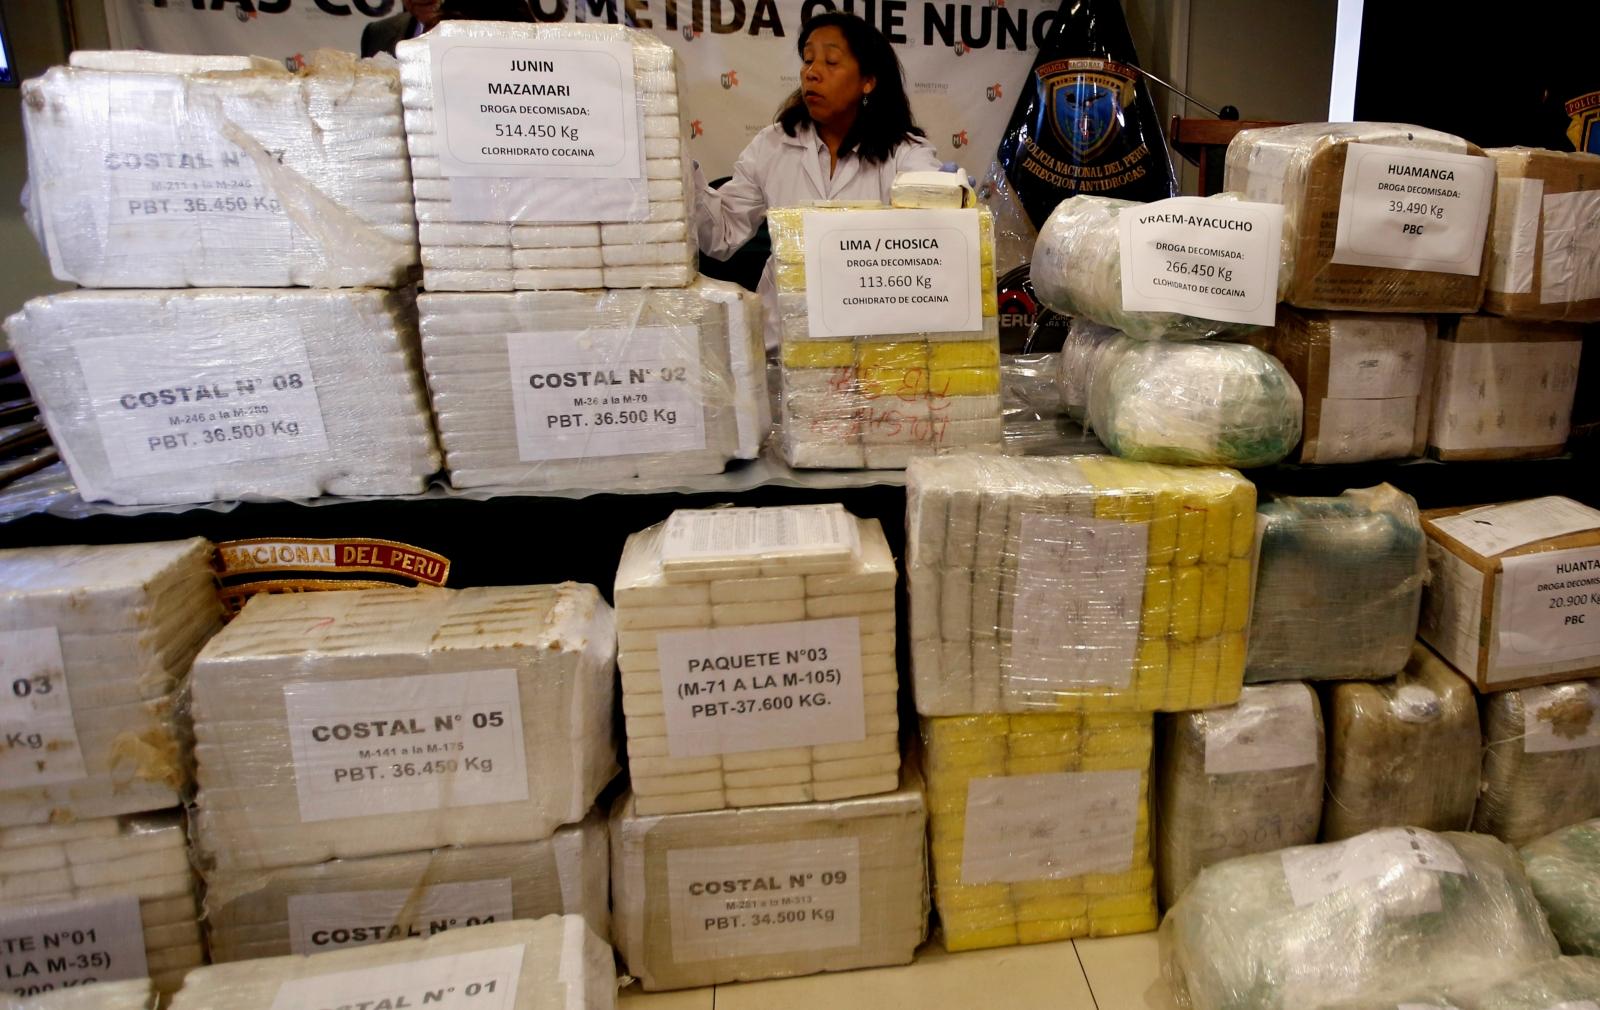 Peru drug seizure